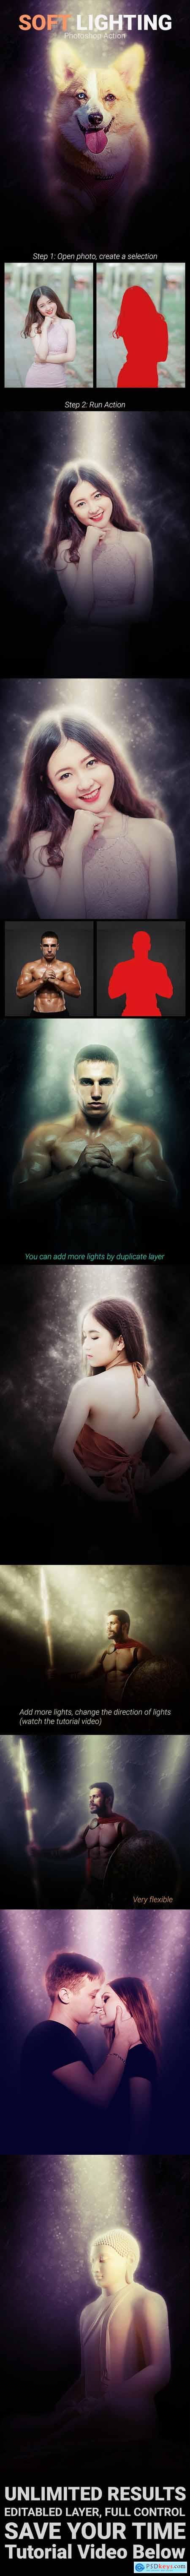 Soft Lighting 22988869